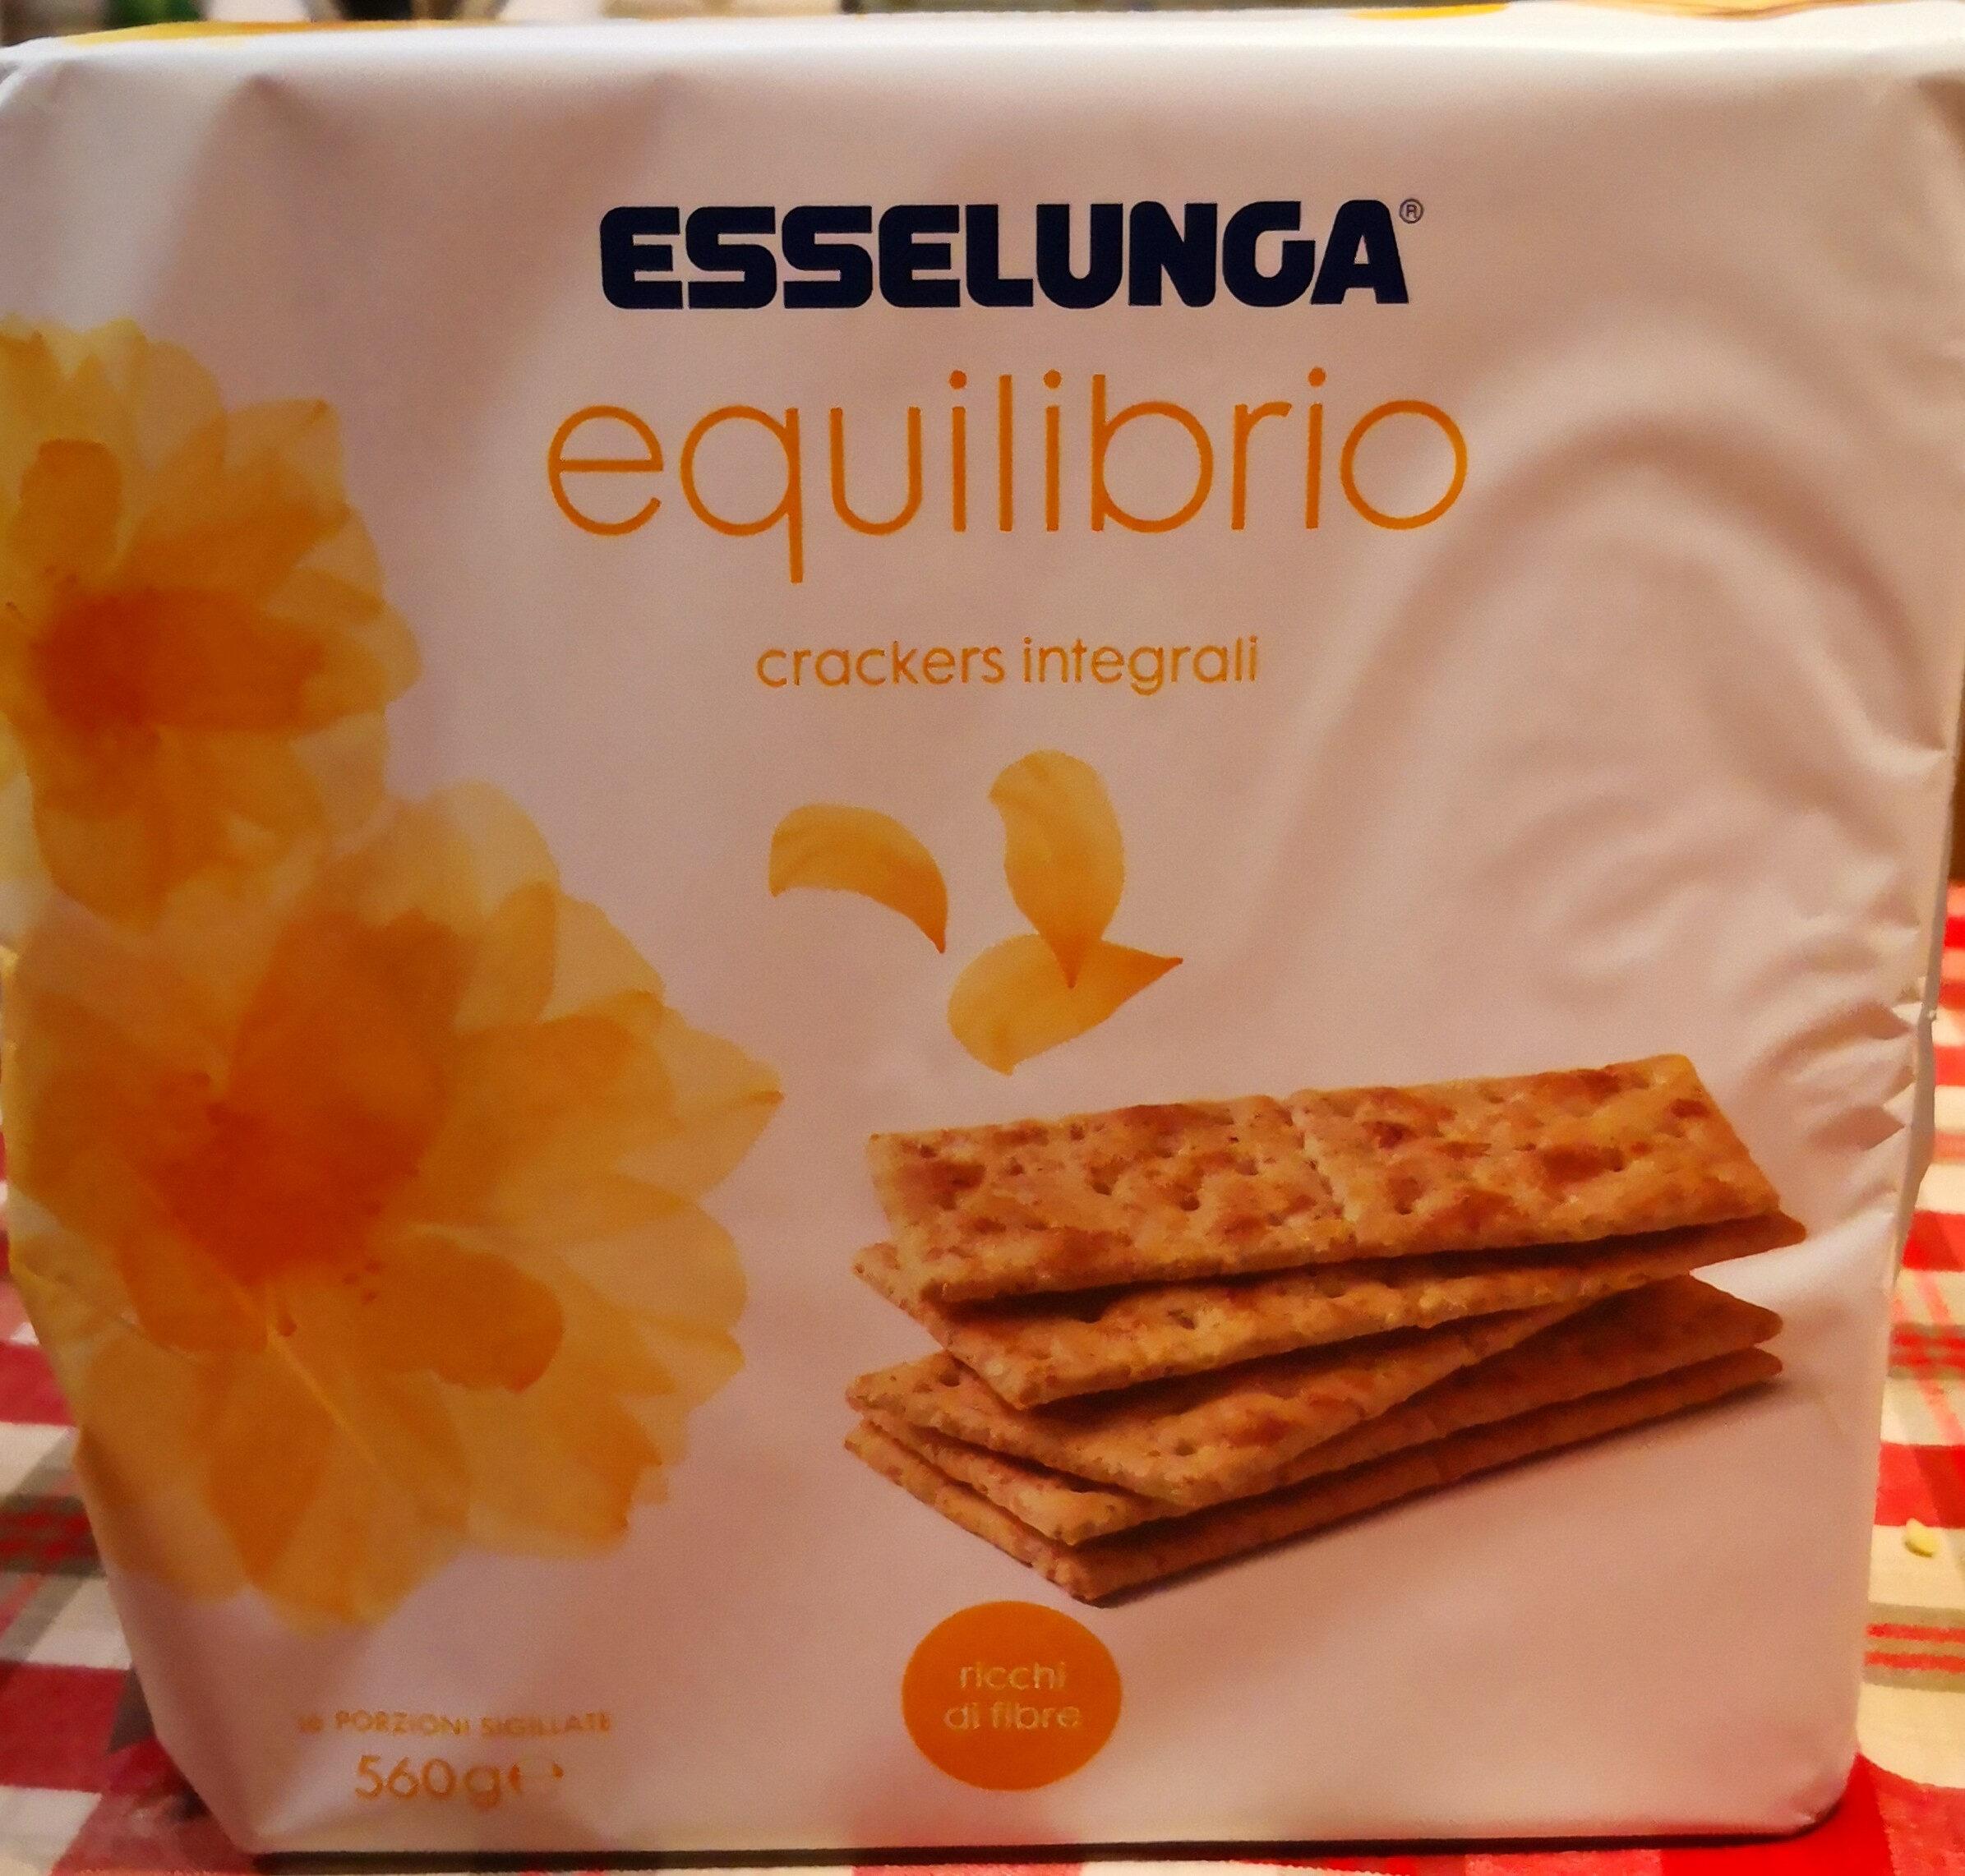 equilibrio crackers integrali - Product